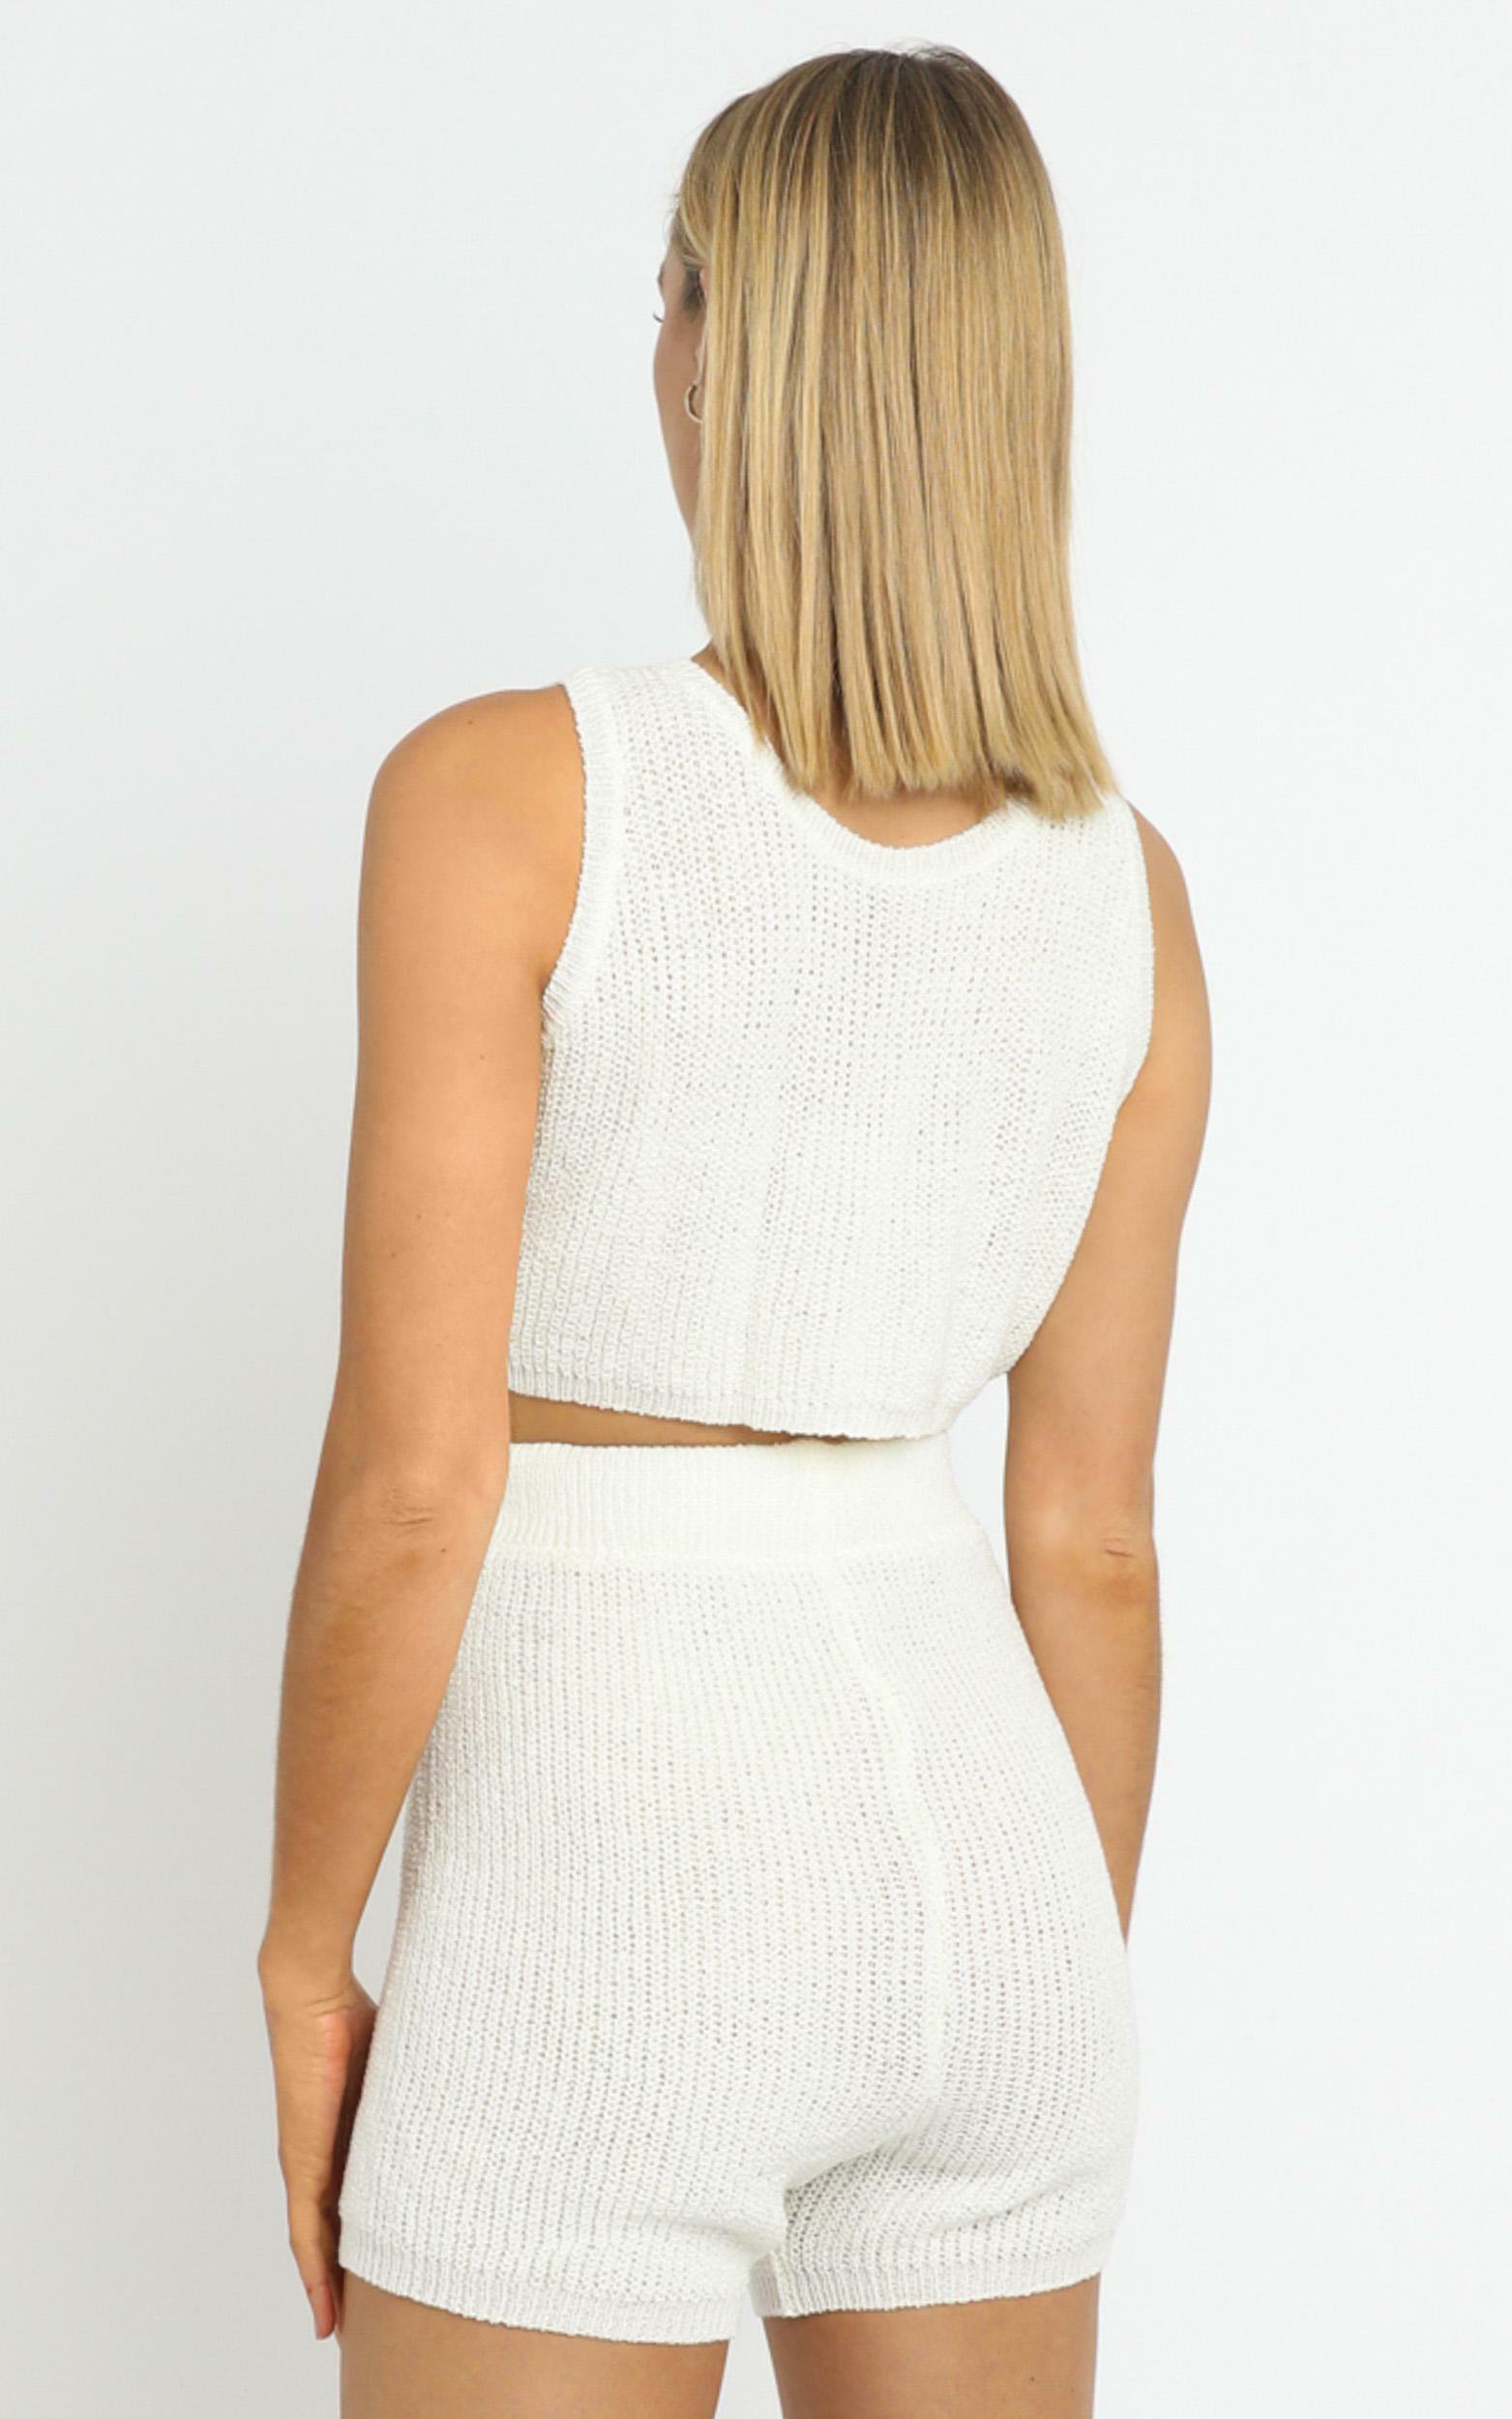 Saffron Knit Three Piece Set White - L/XL, White, hi-res image number null